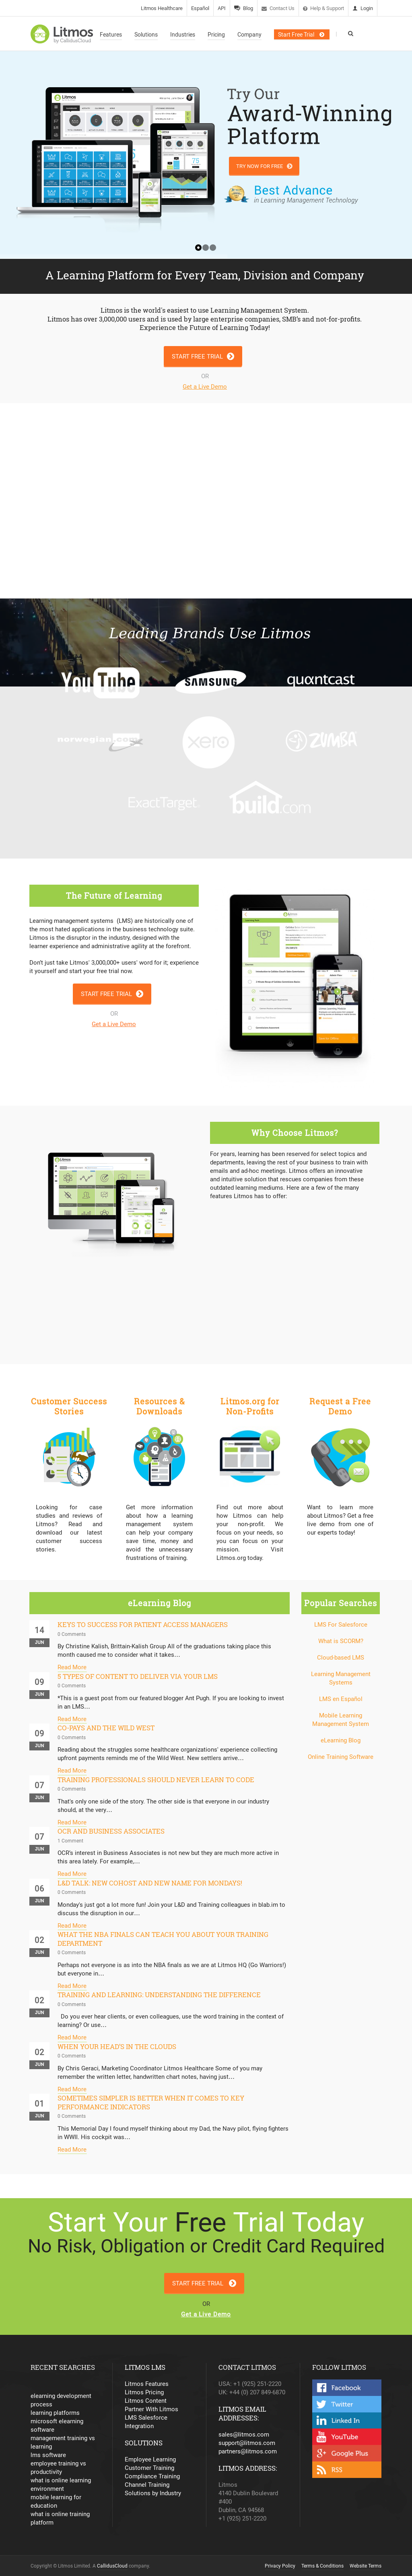 SAP Litmos Competitors, Revenue and Employees - Owler